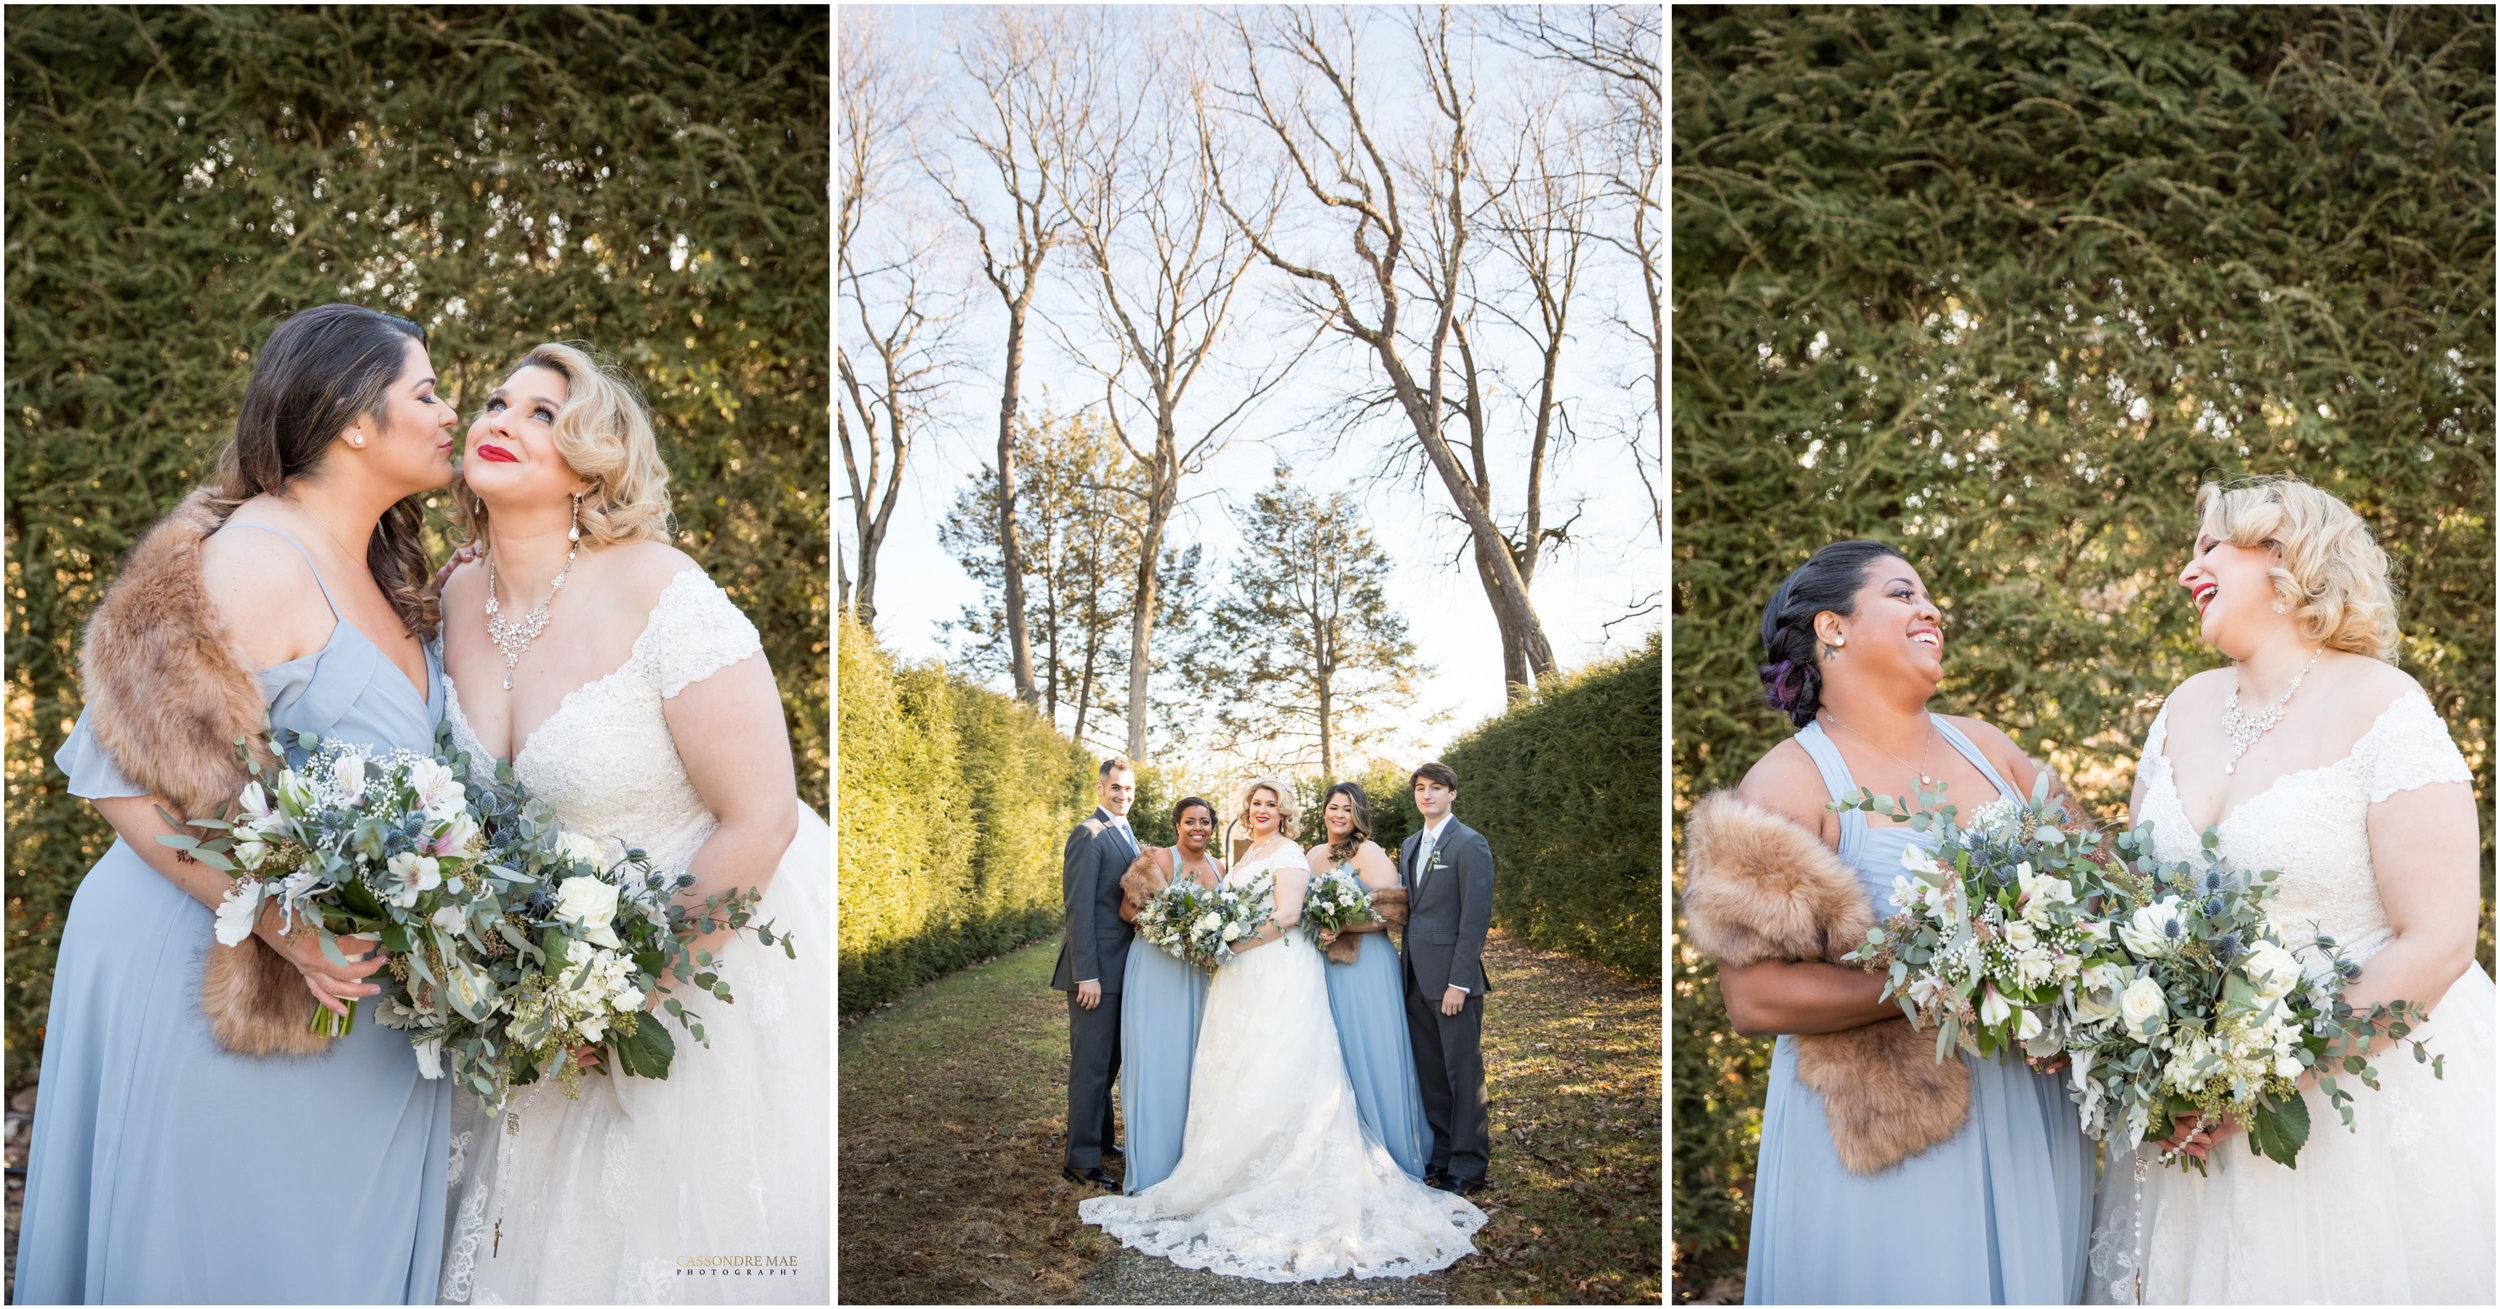 Cassondre Mae Photography Poughkeepsie NY Wedding 21.jpg